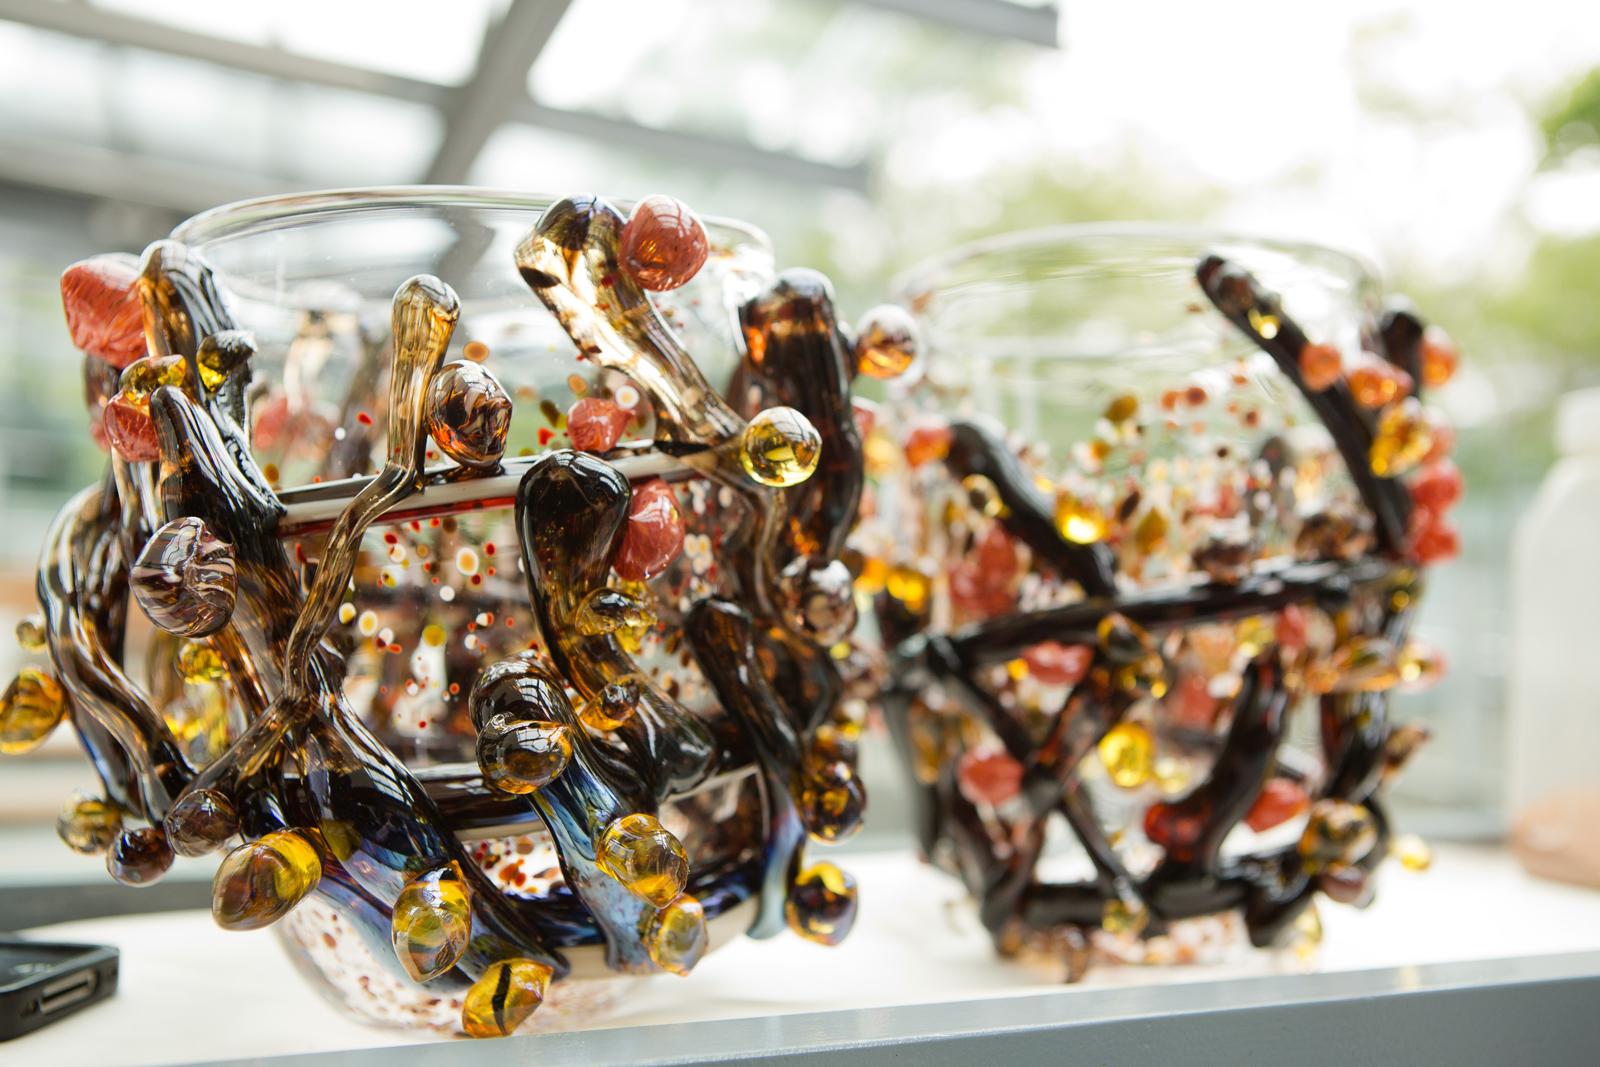 Design prototype by Michele Oka Doner for GlassLab